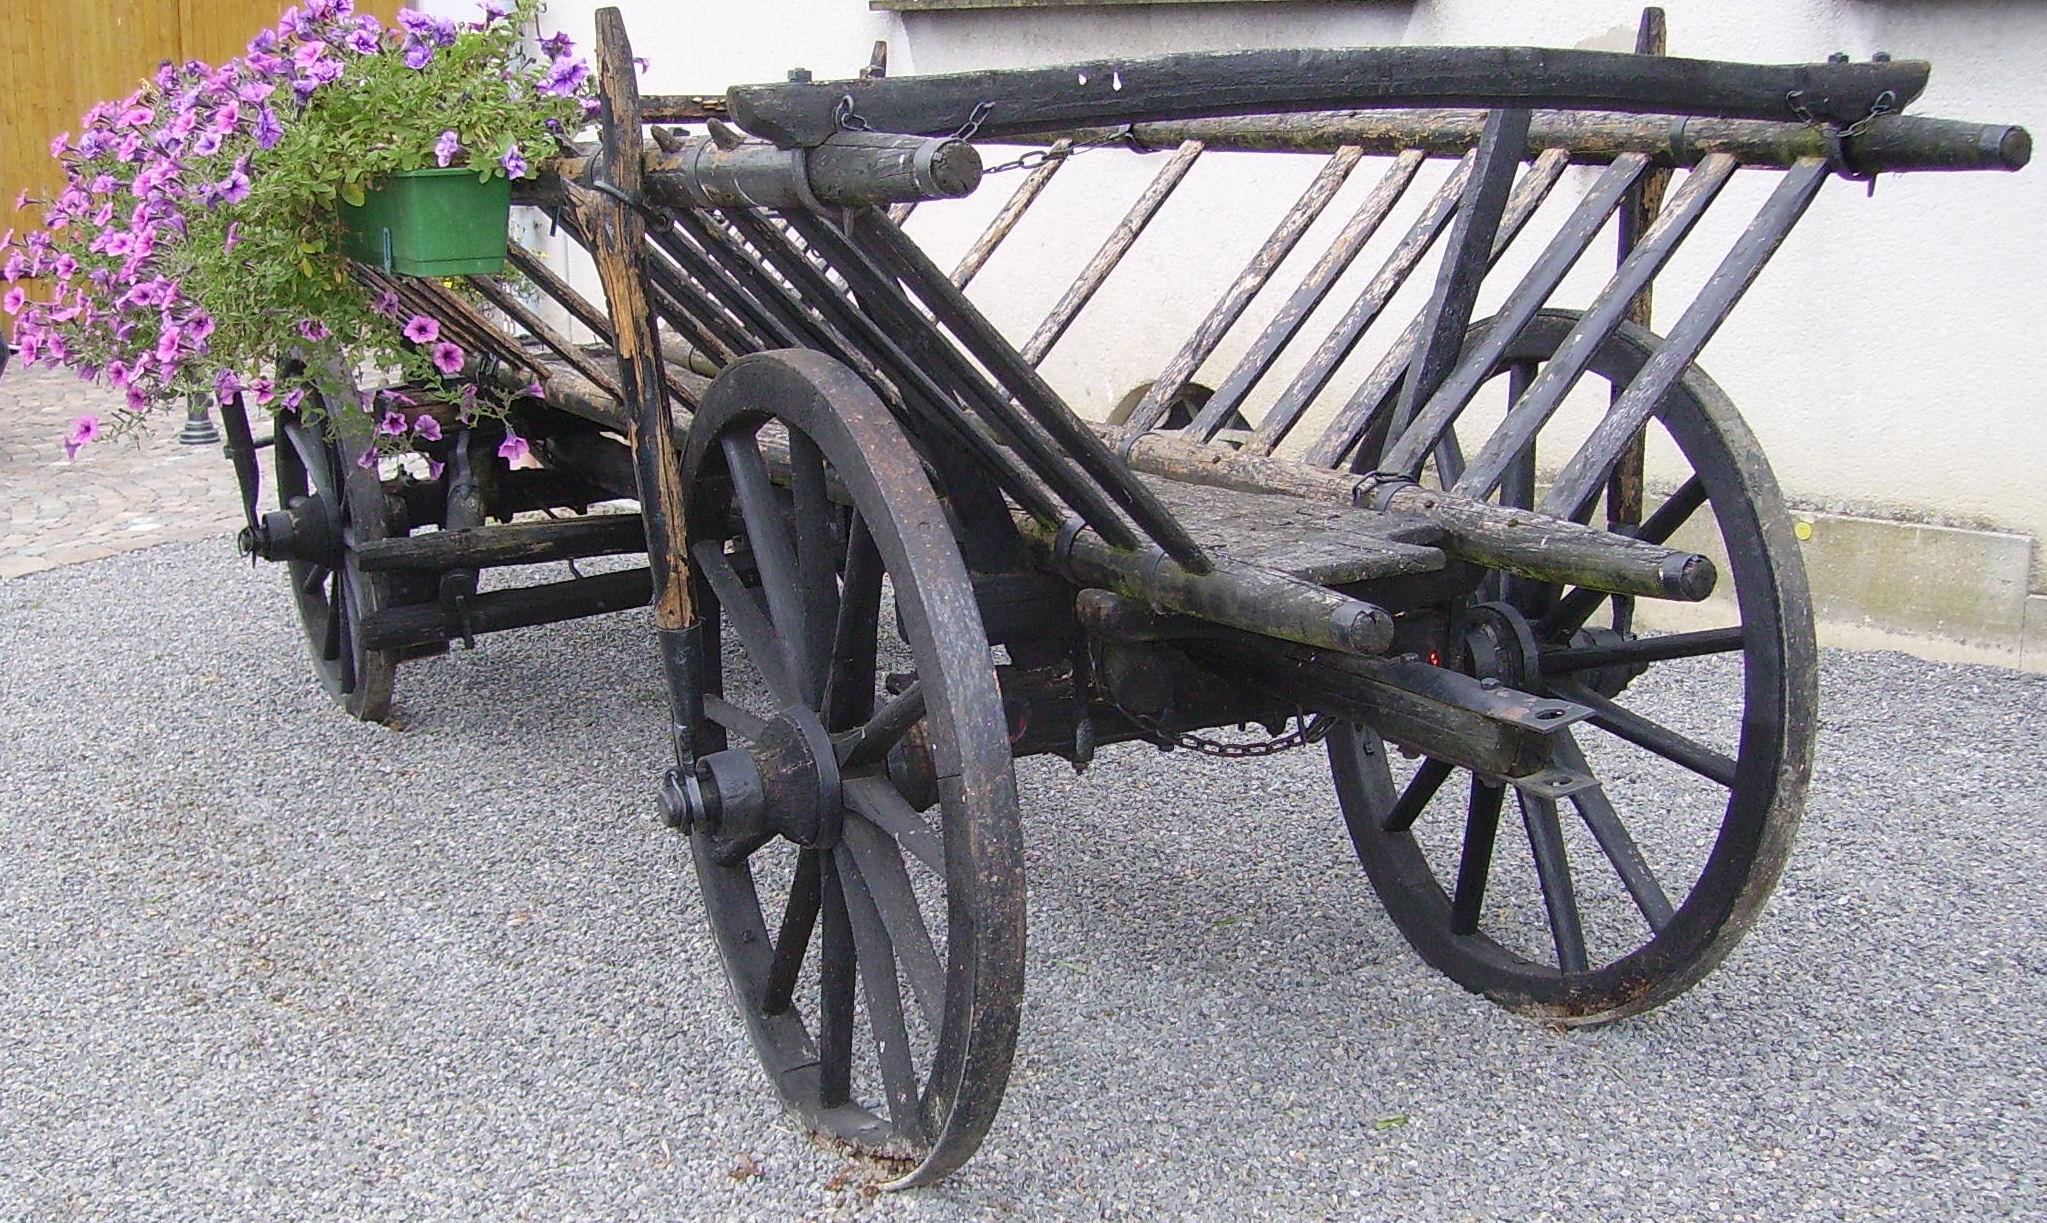 Hammer Heimtex In Aachen : File:Kohlhof Leiterwagen 2.JPG – Wikimedia Commons